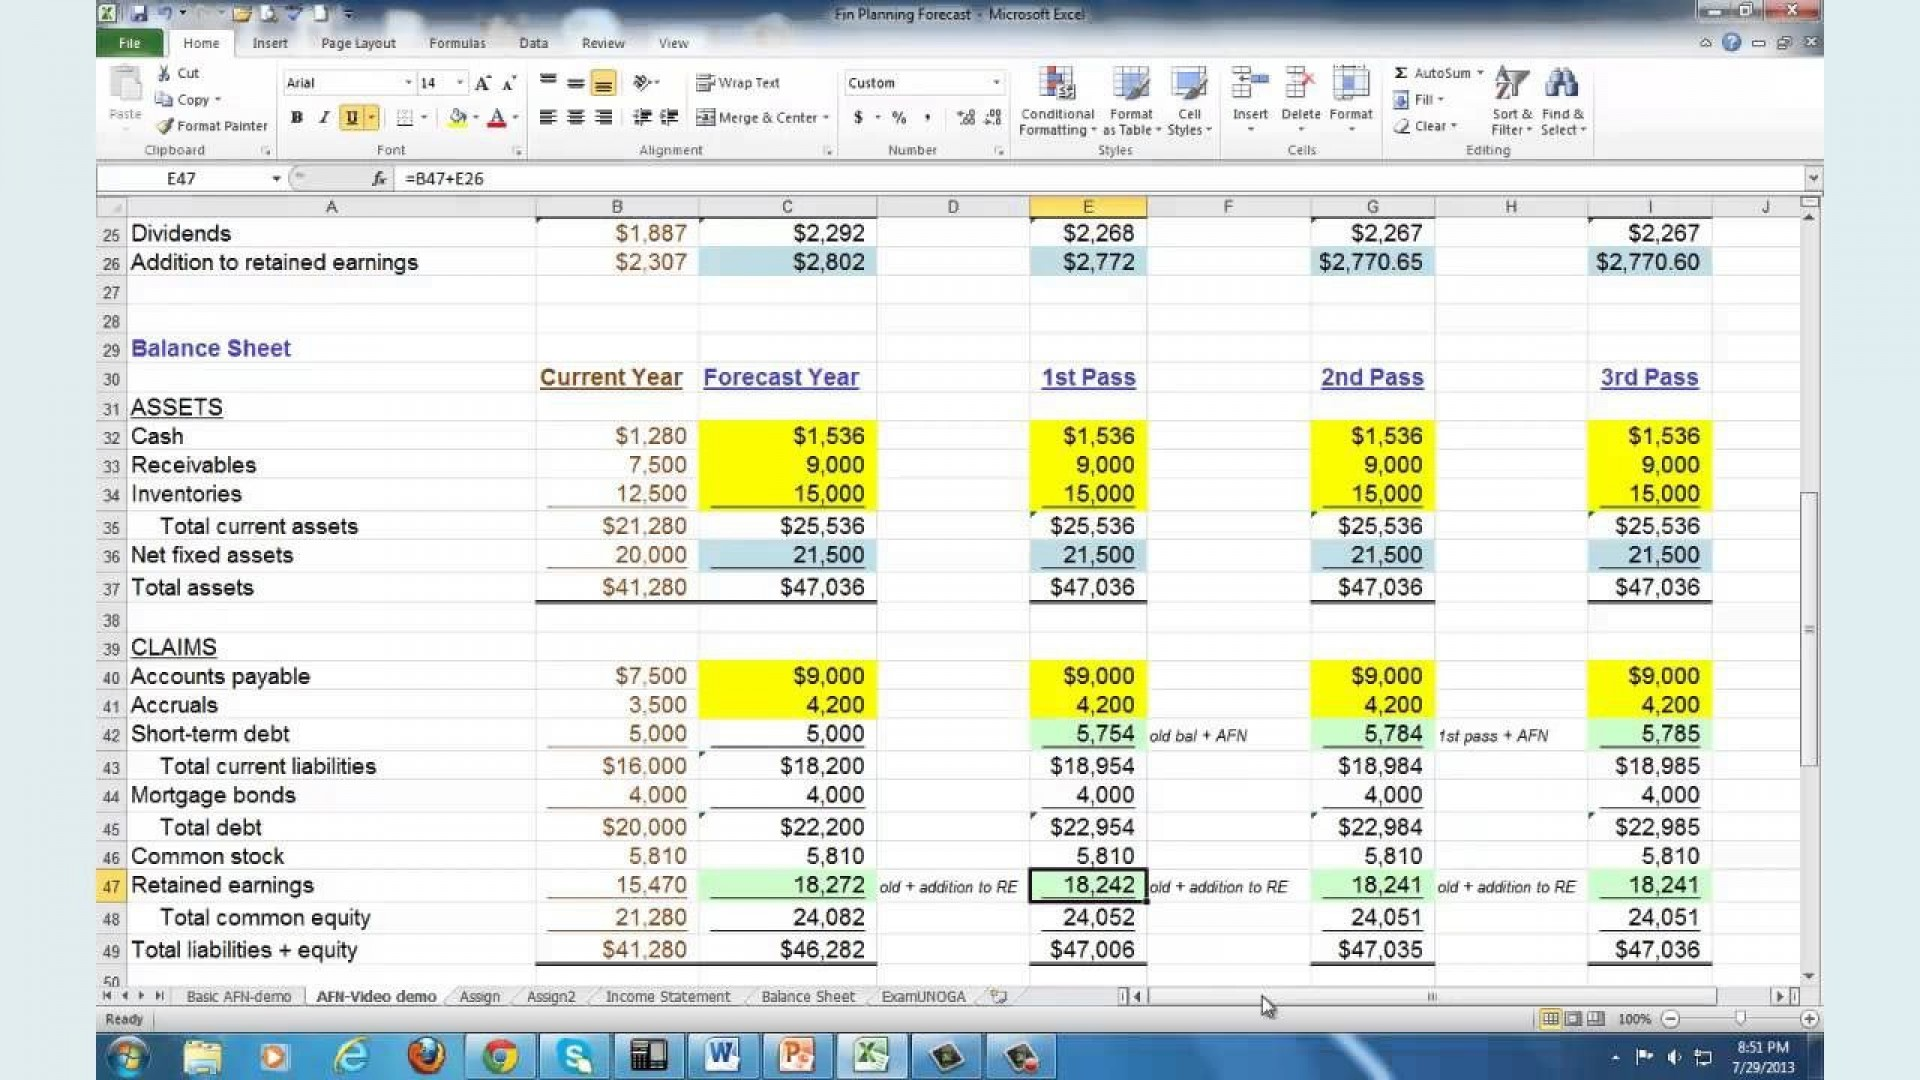 003 Imposing Financial Plan Template Excel Design  Strategic Busines Simple1920